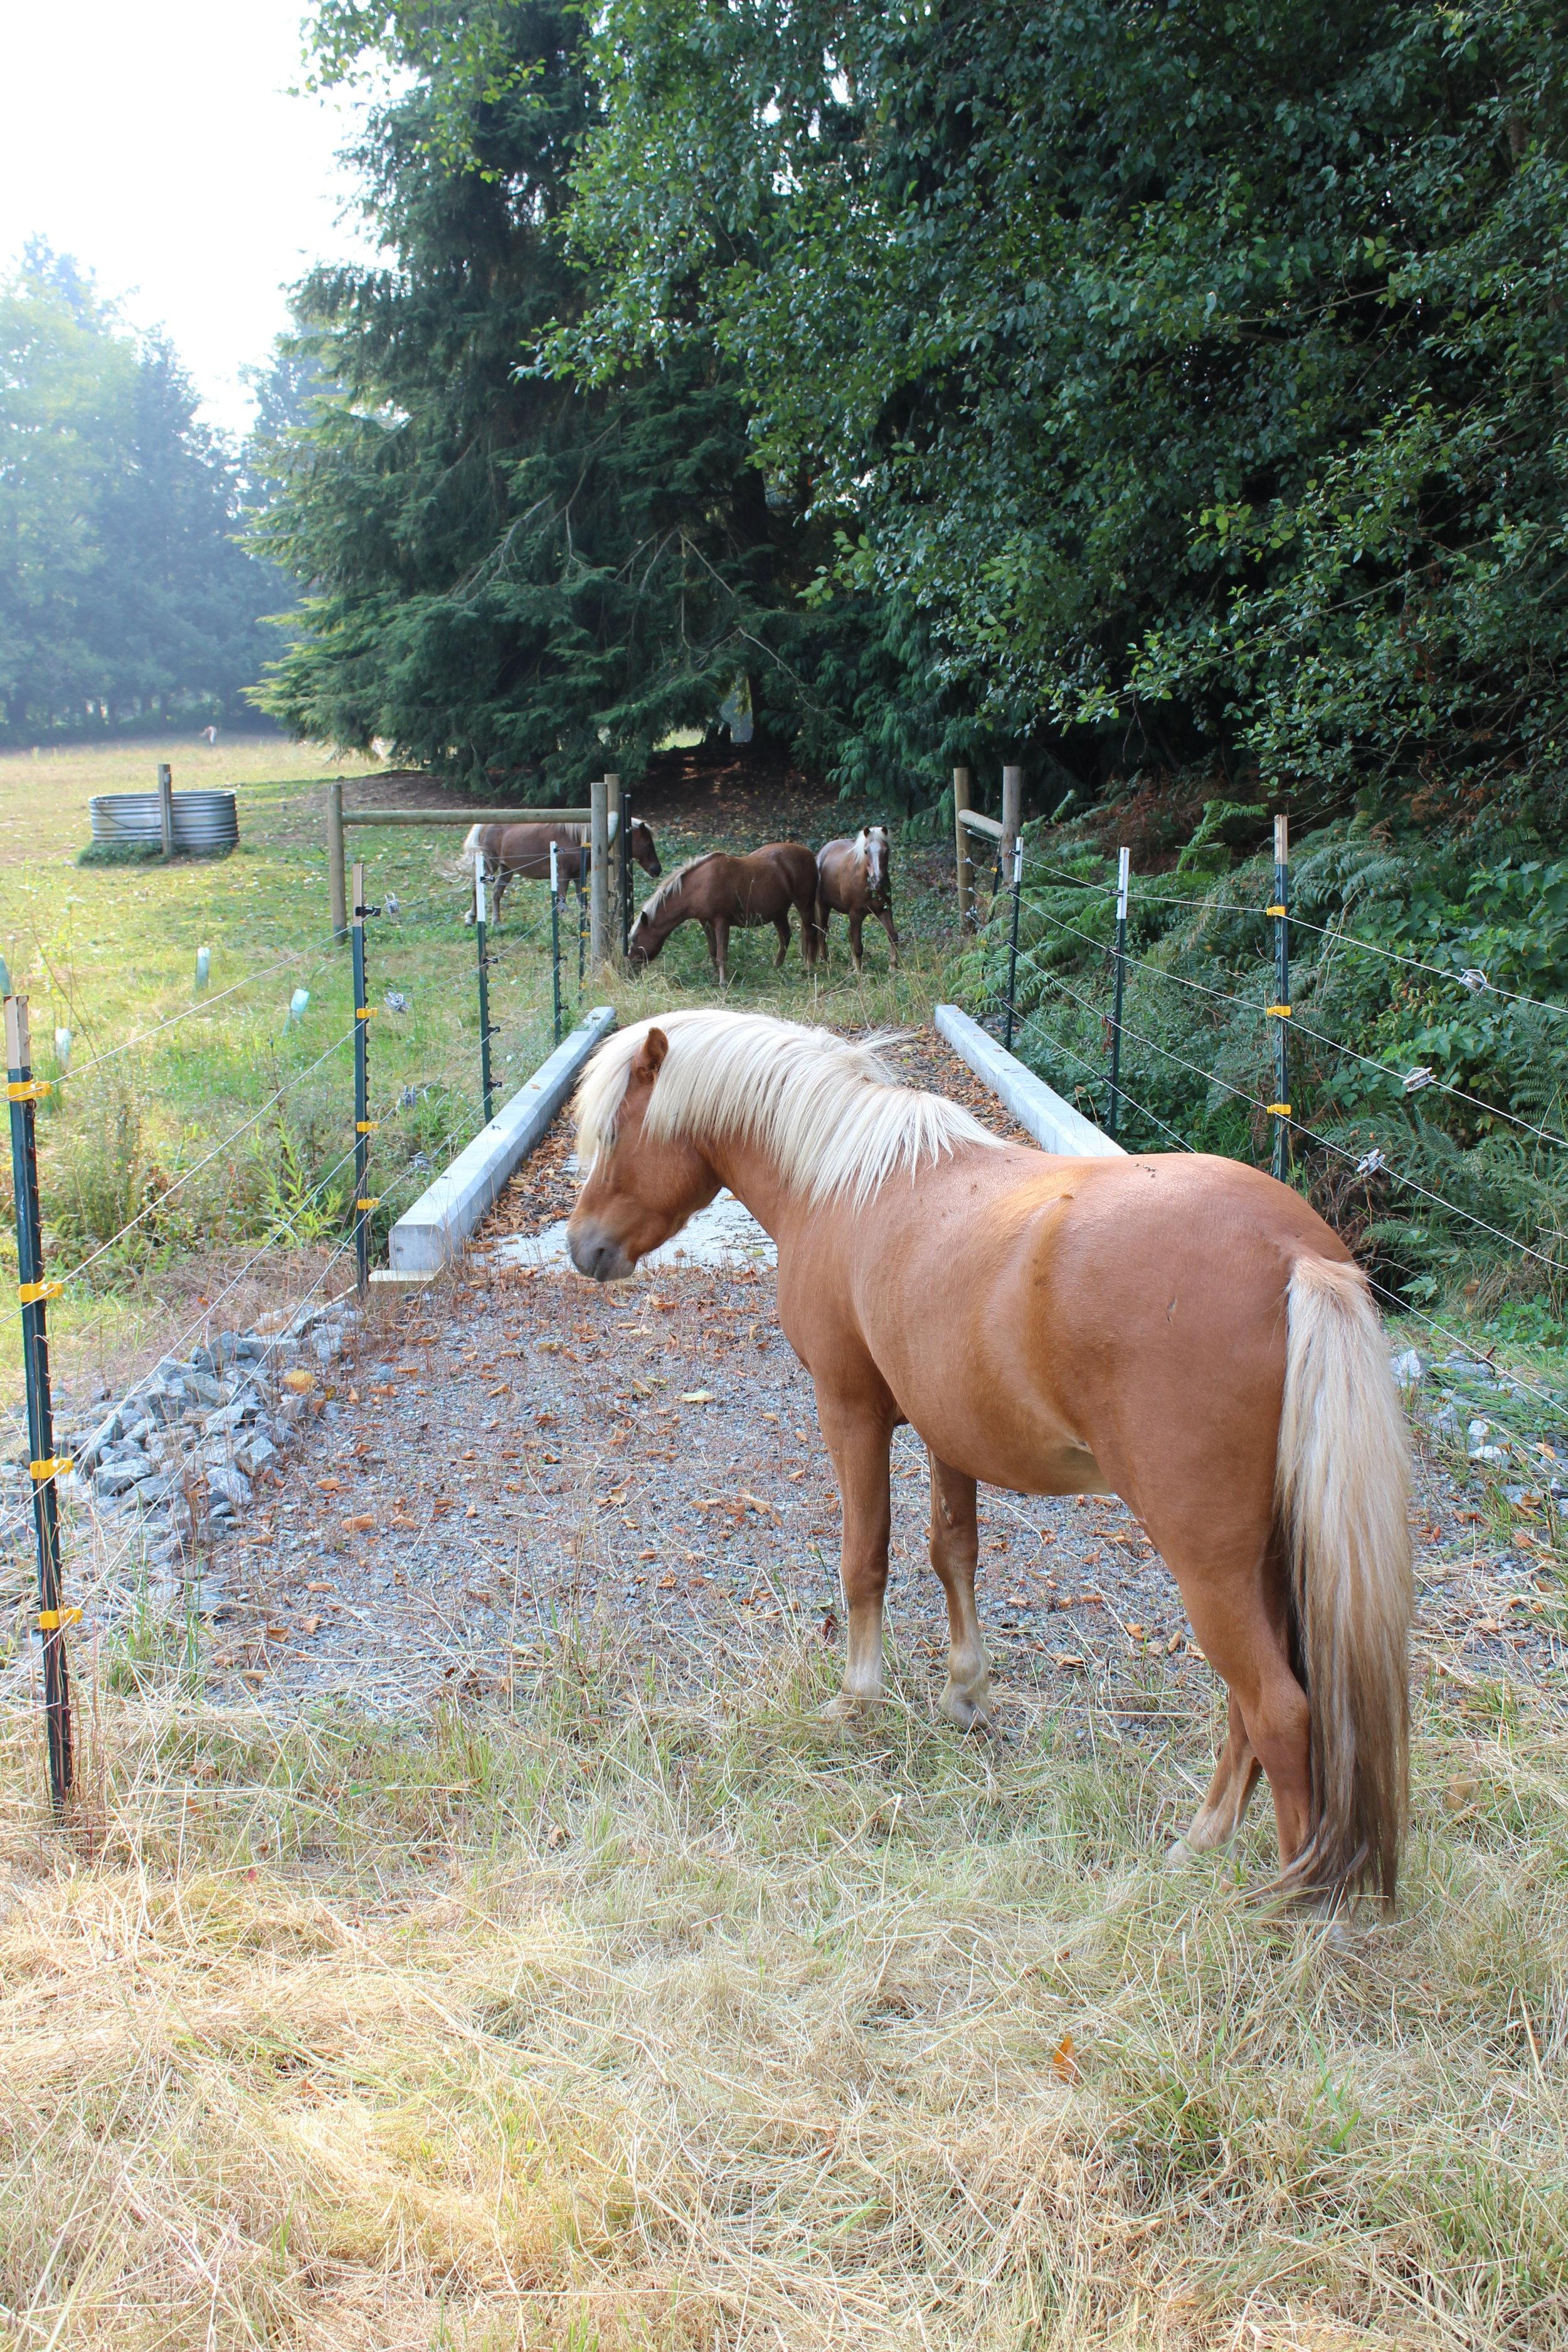 The American Shetland horses travel across the livestock bridge for the first time.